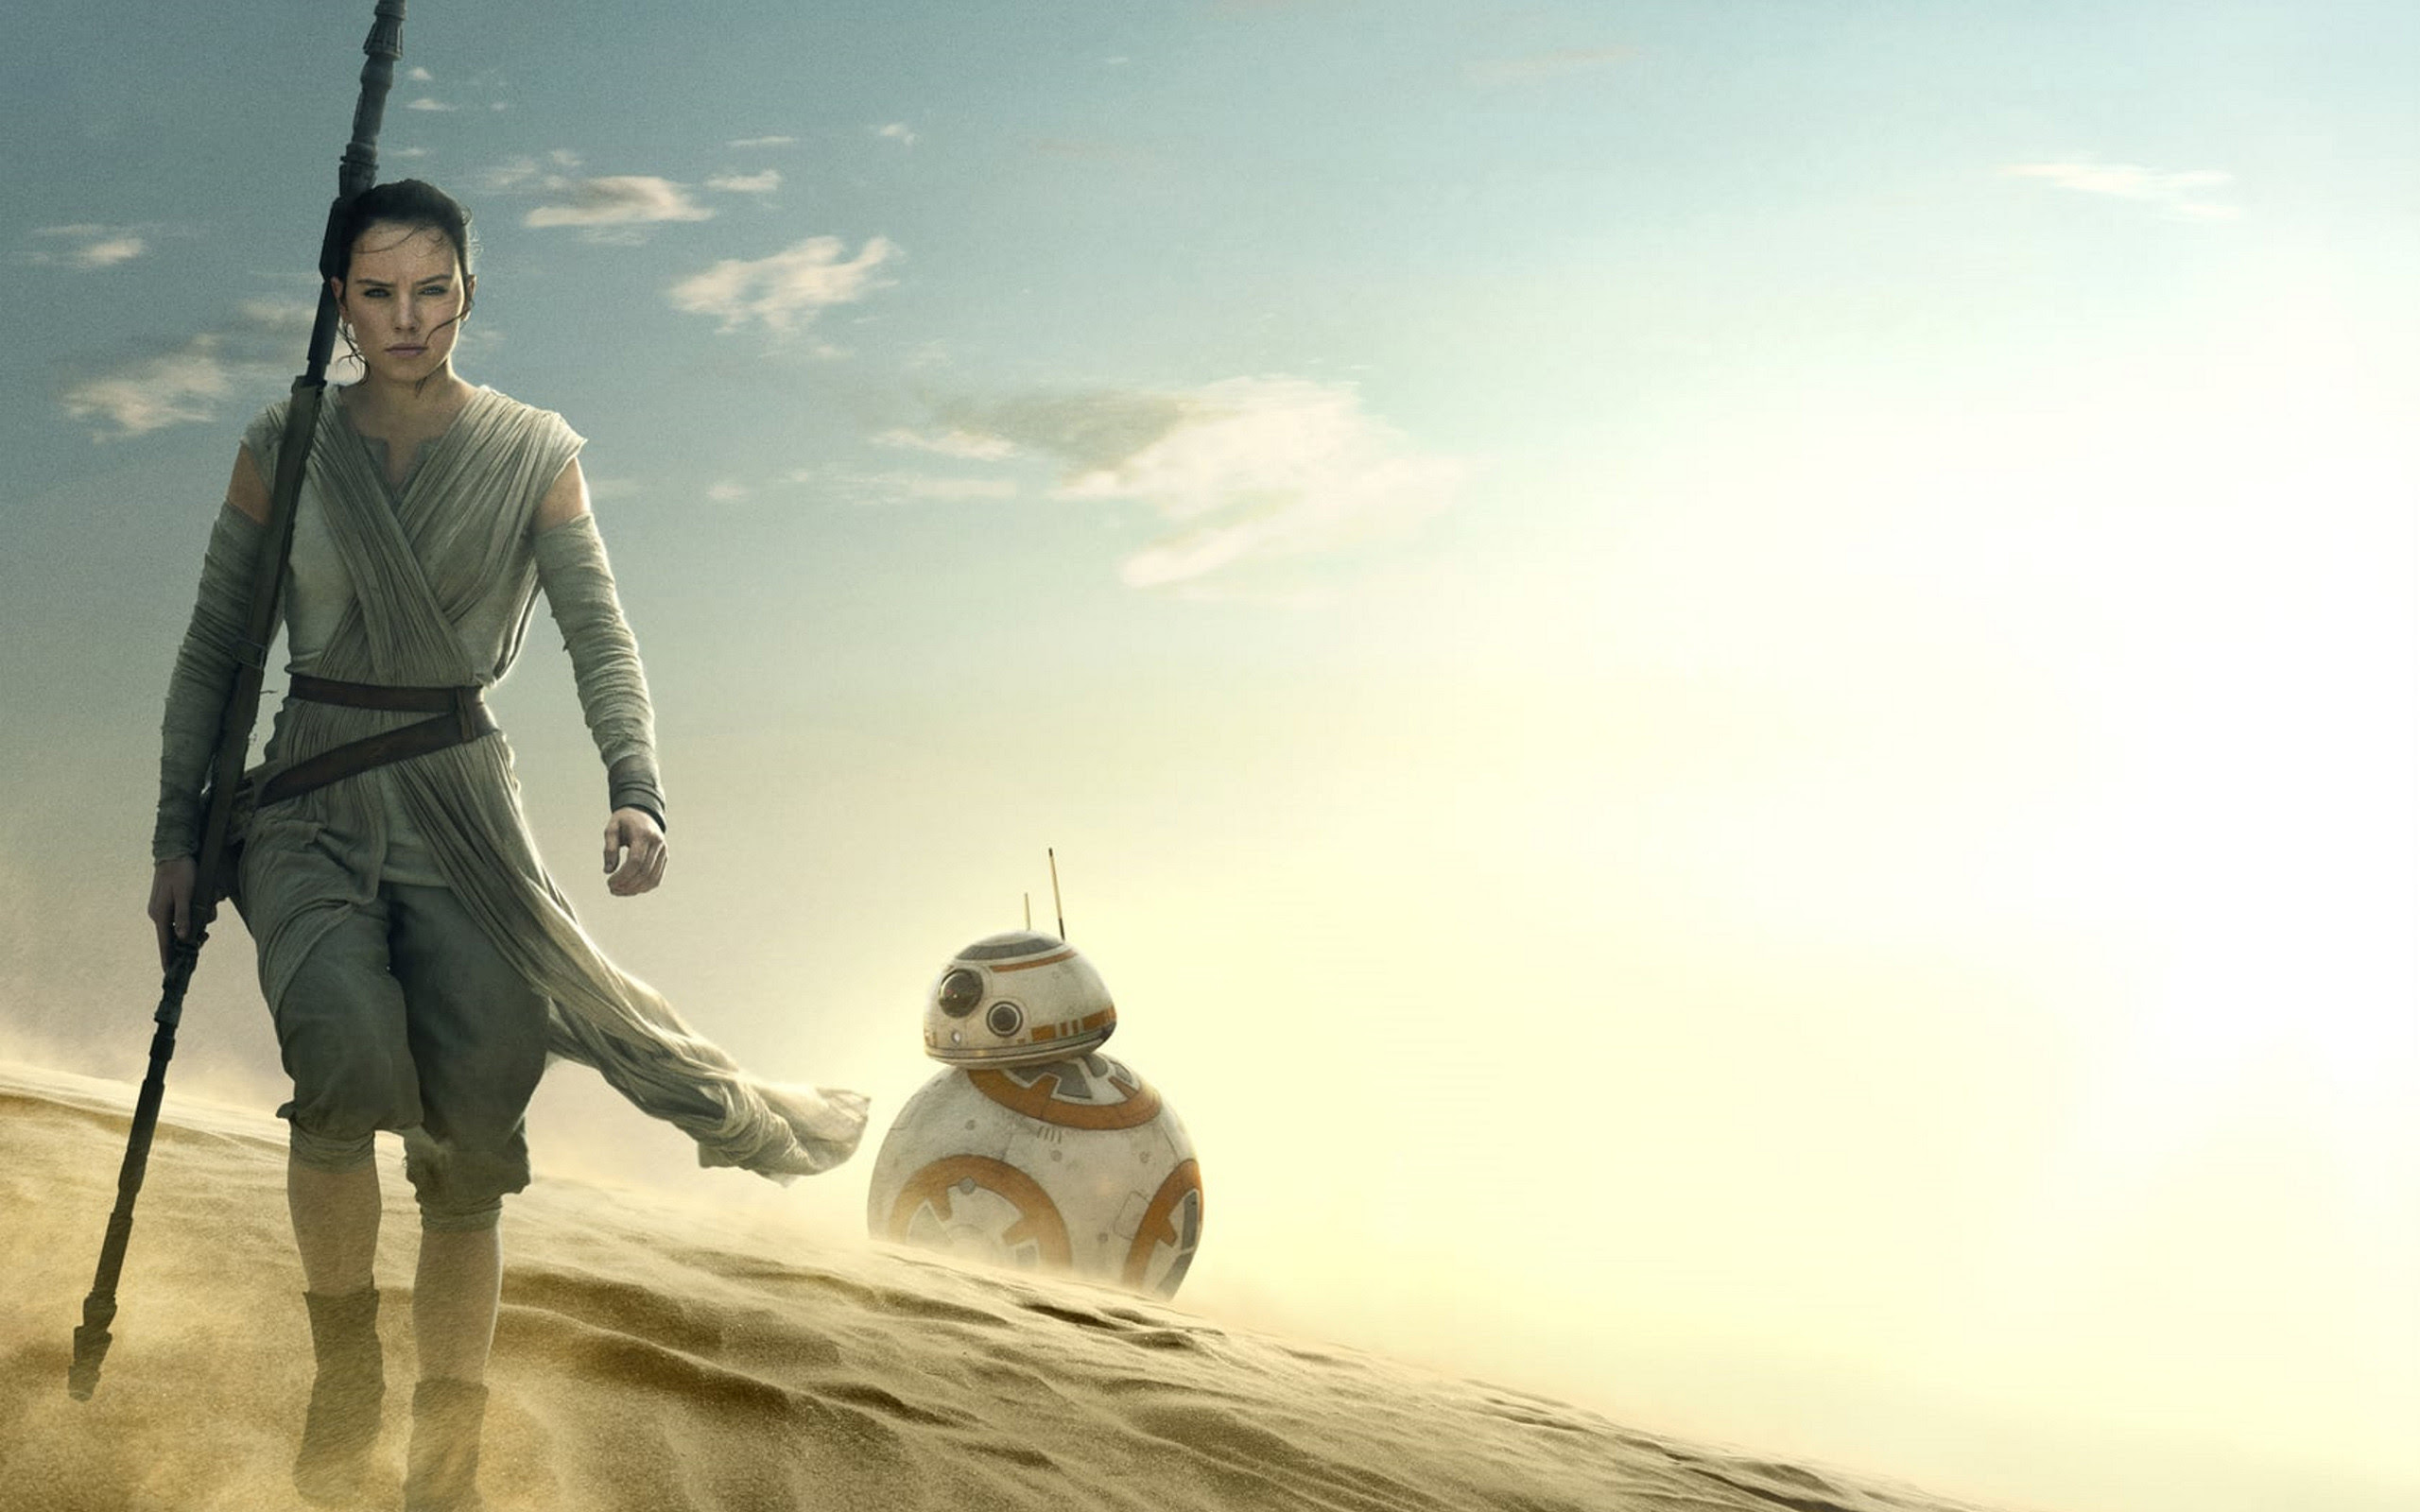 Rey Star Wars Wallpaper 74 Images